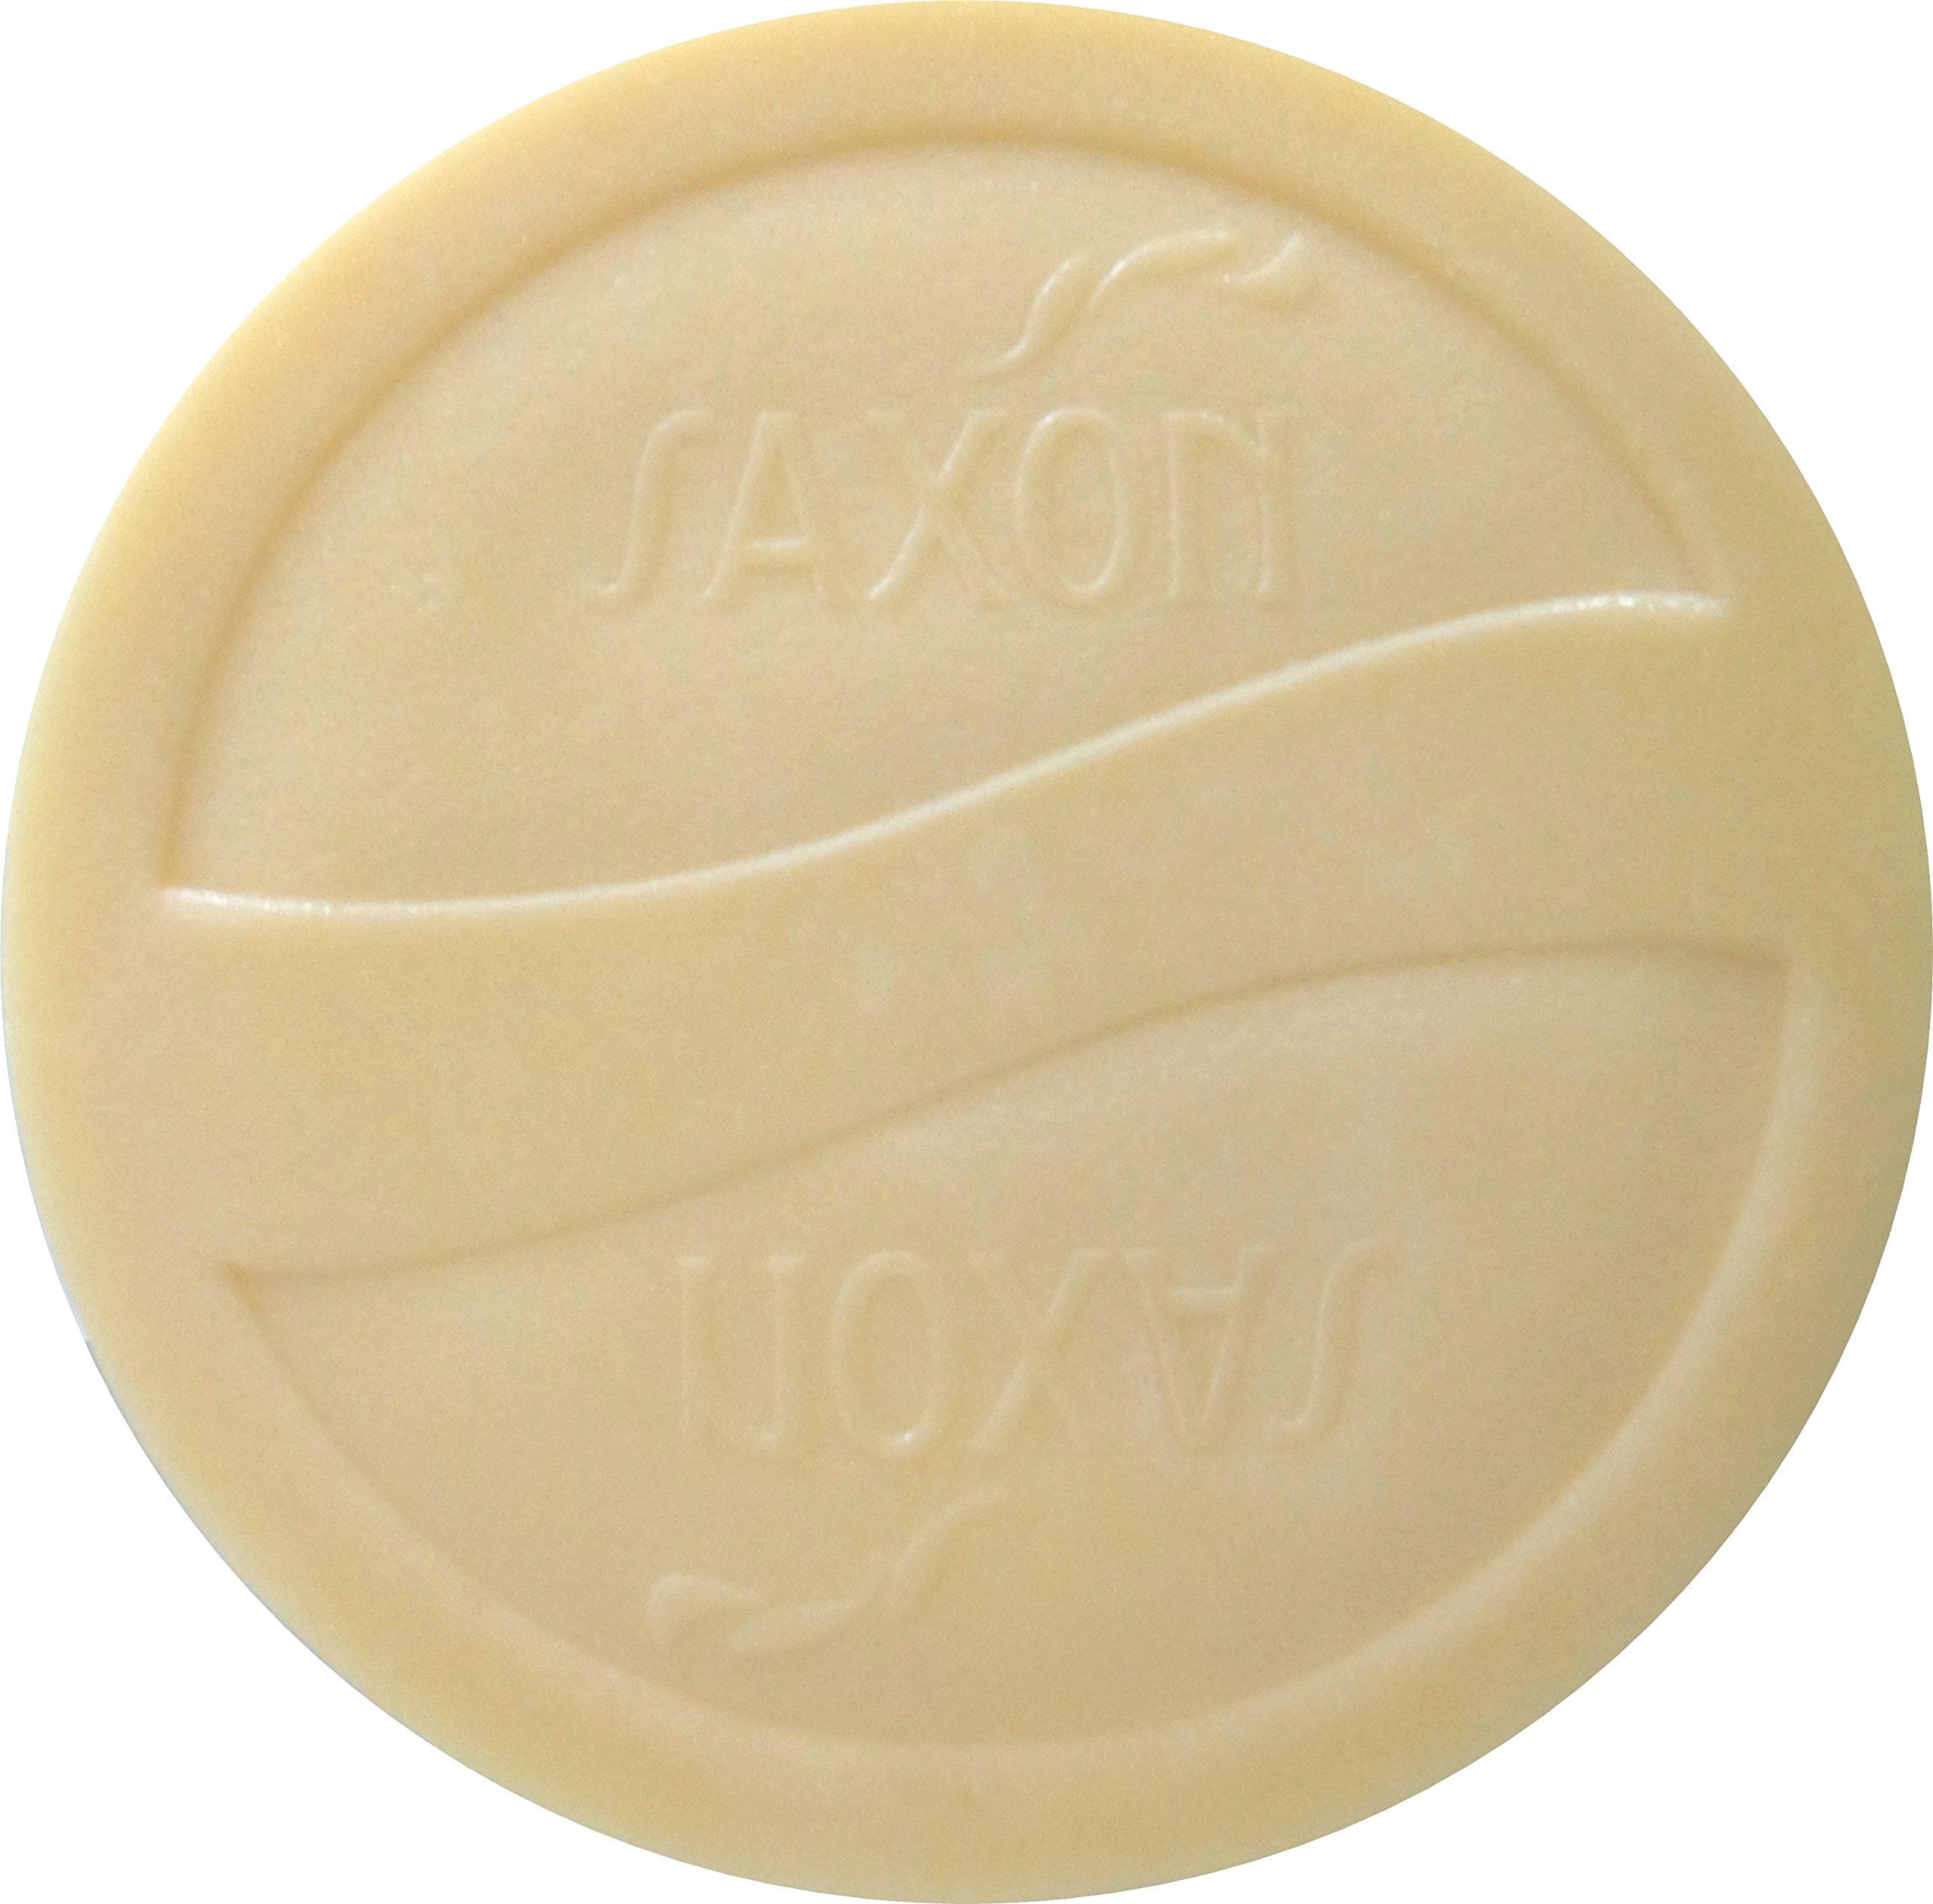 Saxon Creamery Snowfields Aged Butterkase Cheese 12lb Wheel by Saxon Creamery